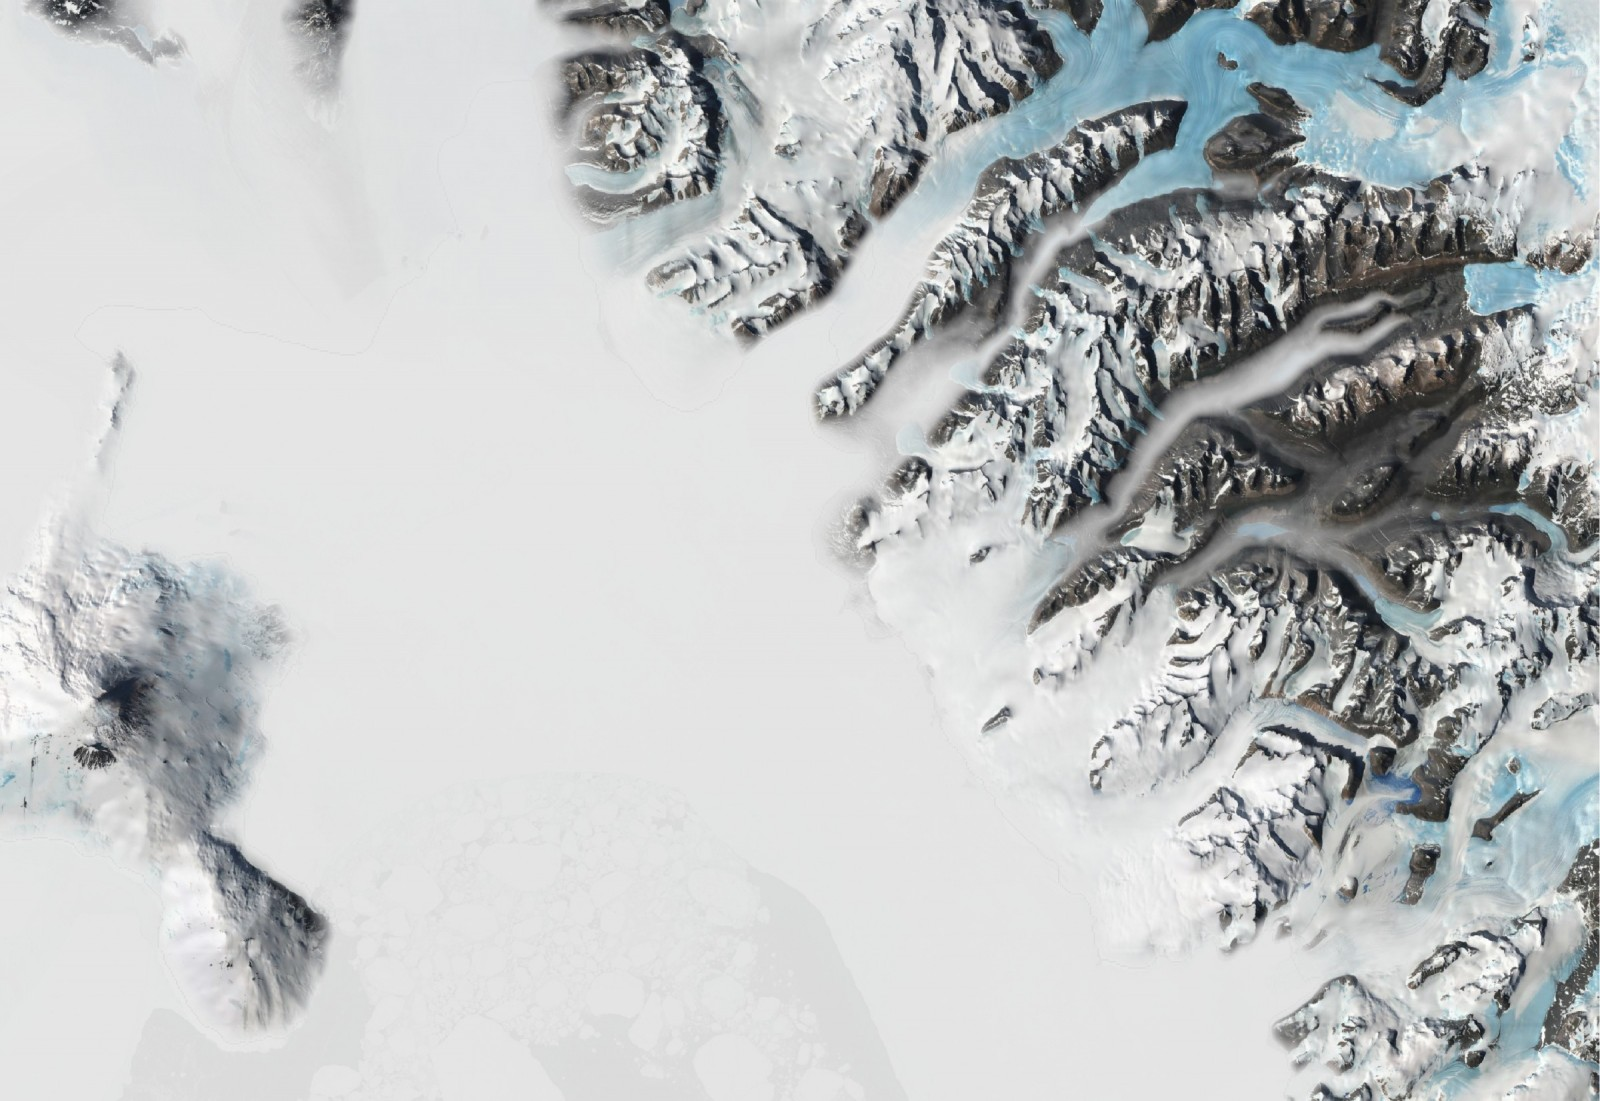 Cryospheric Sciences | Quantarctica: Mapping Antarctica has never